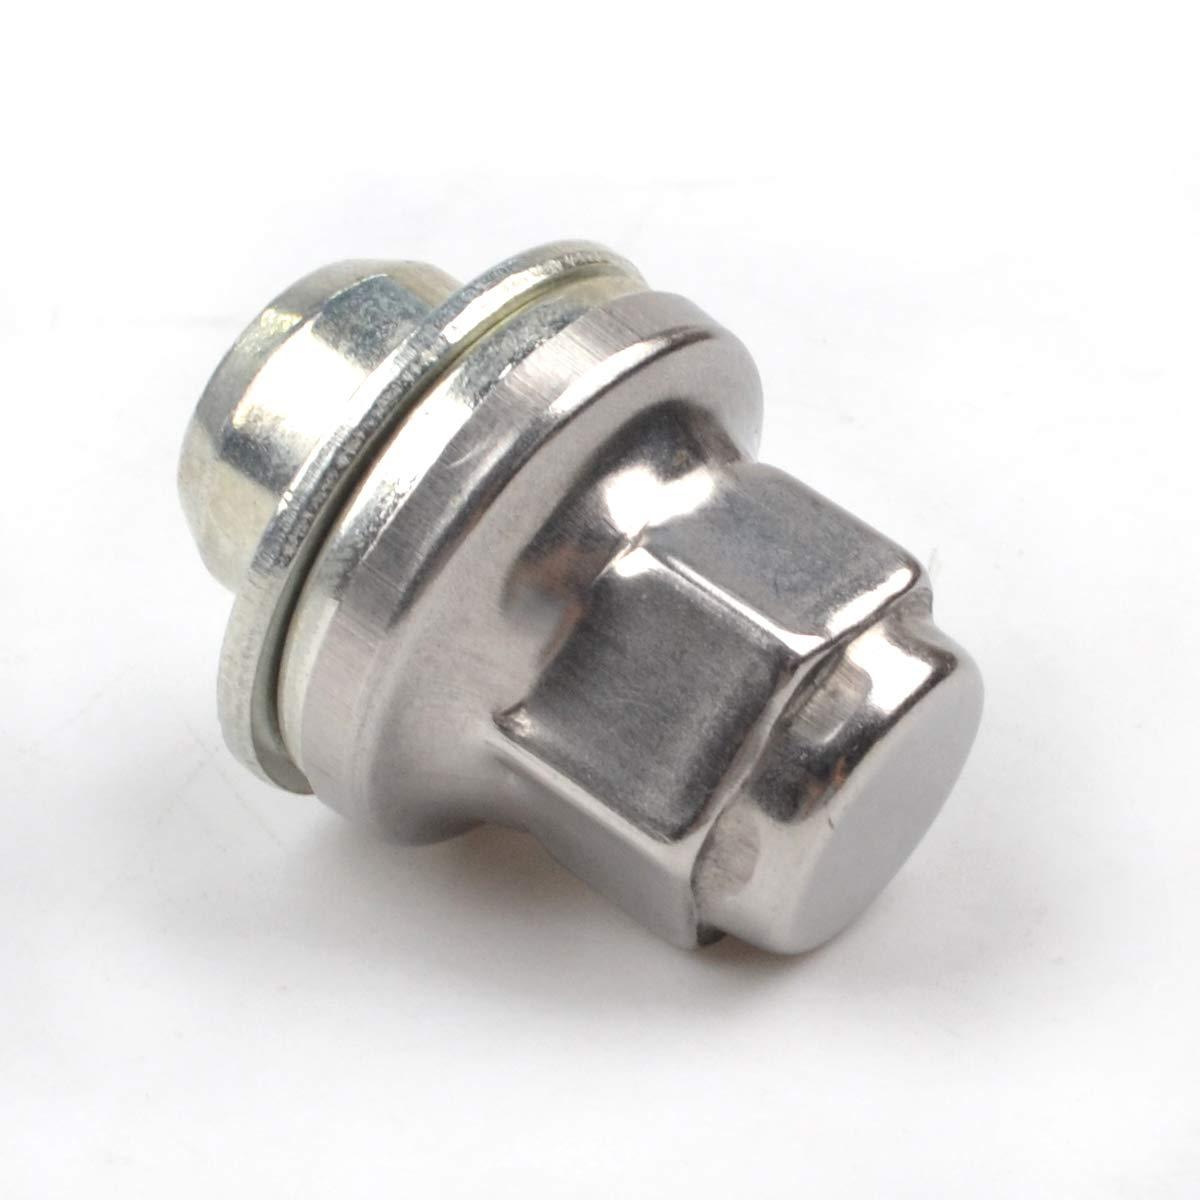 RunQiao Replacement Alloy Wheel Nuts Chrome Lug Bolt Stud M12 x 1.5 Thread 4 PCS